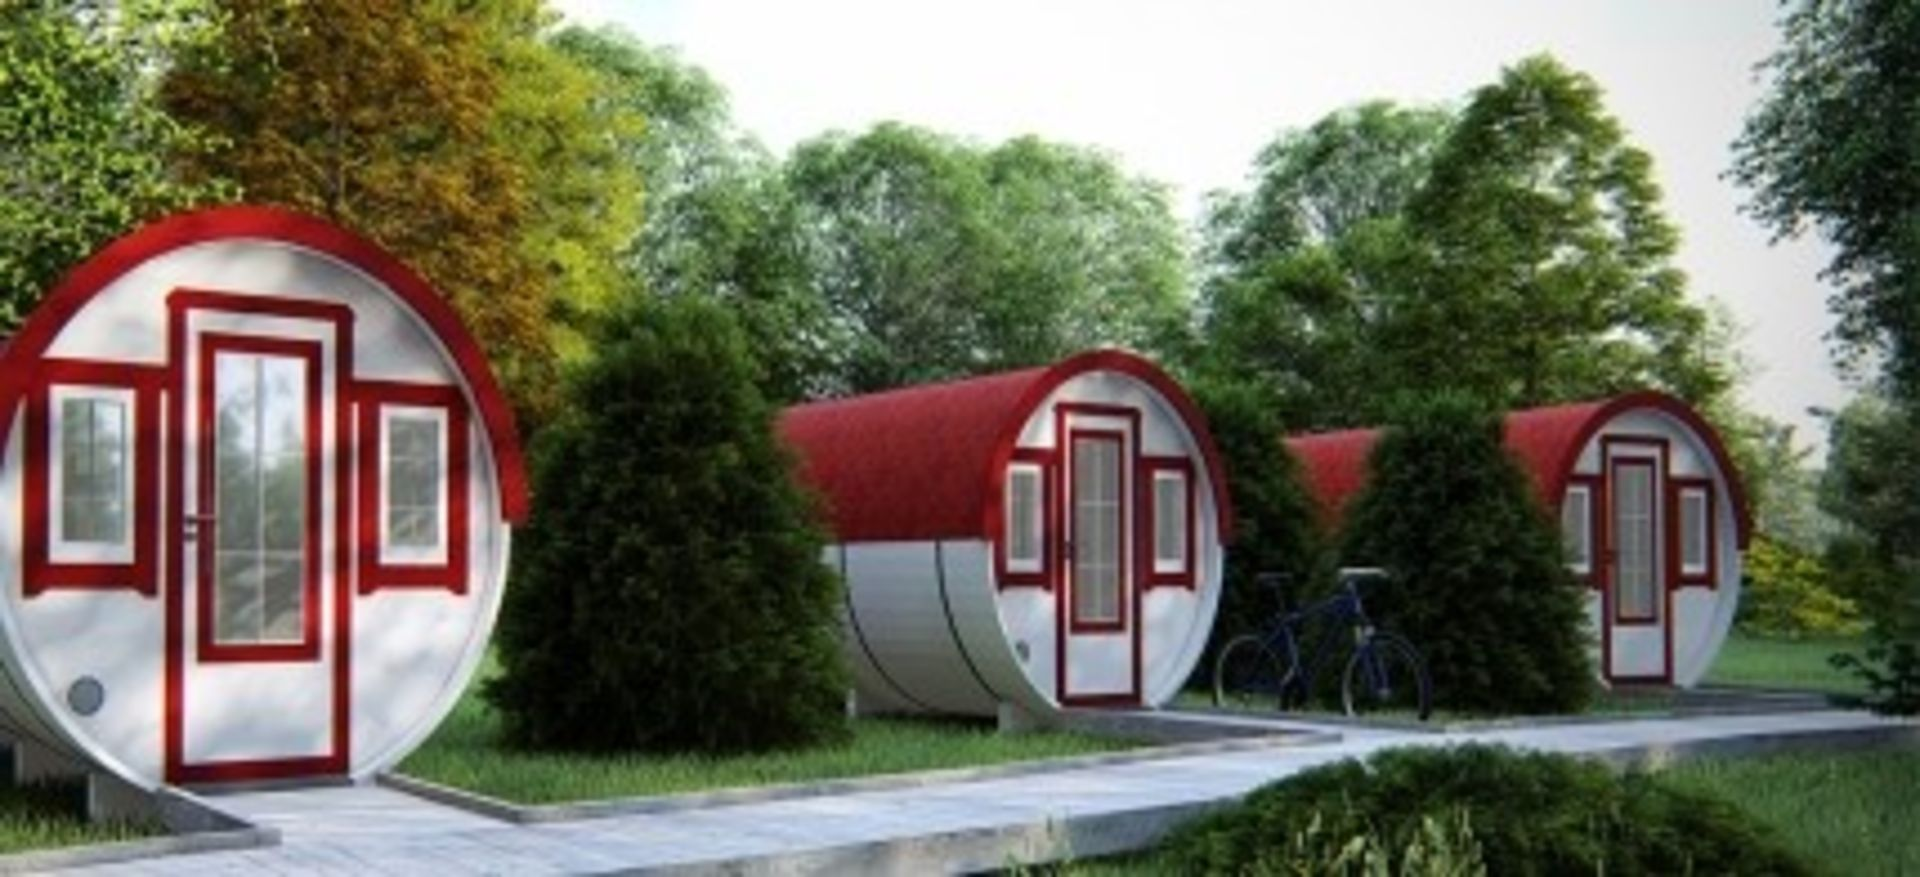 Lot 18021 - V Brand New 2.2 x 4.4m Barrel For Sleeping - Family Size - Sleeping & Sitting Rooms Inside -